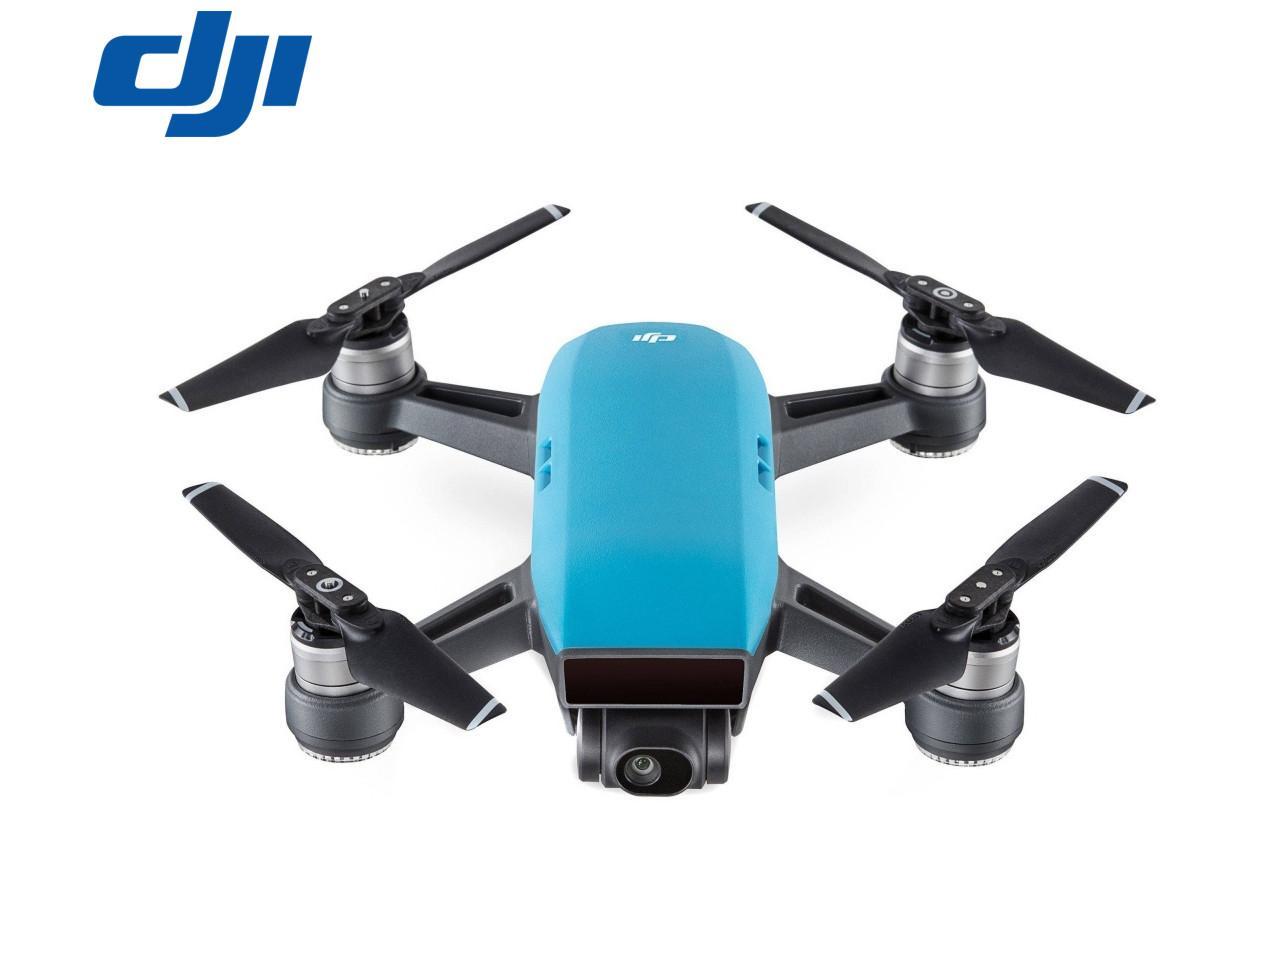 DJI Spark Fly More Combo Sky Blue (DJIS0201C)